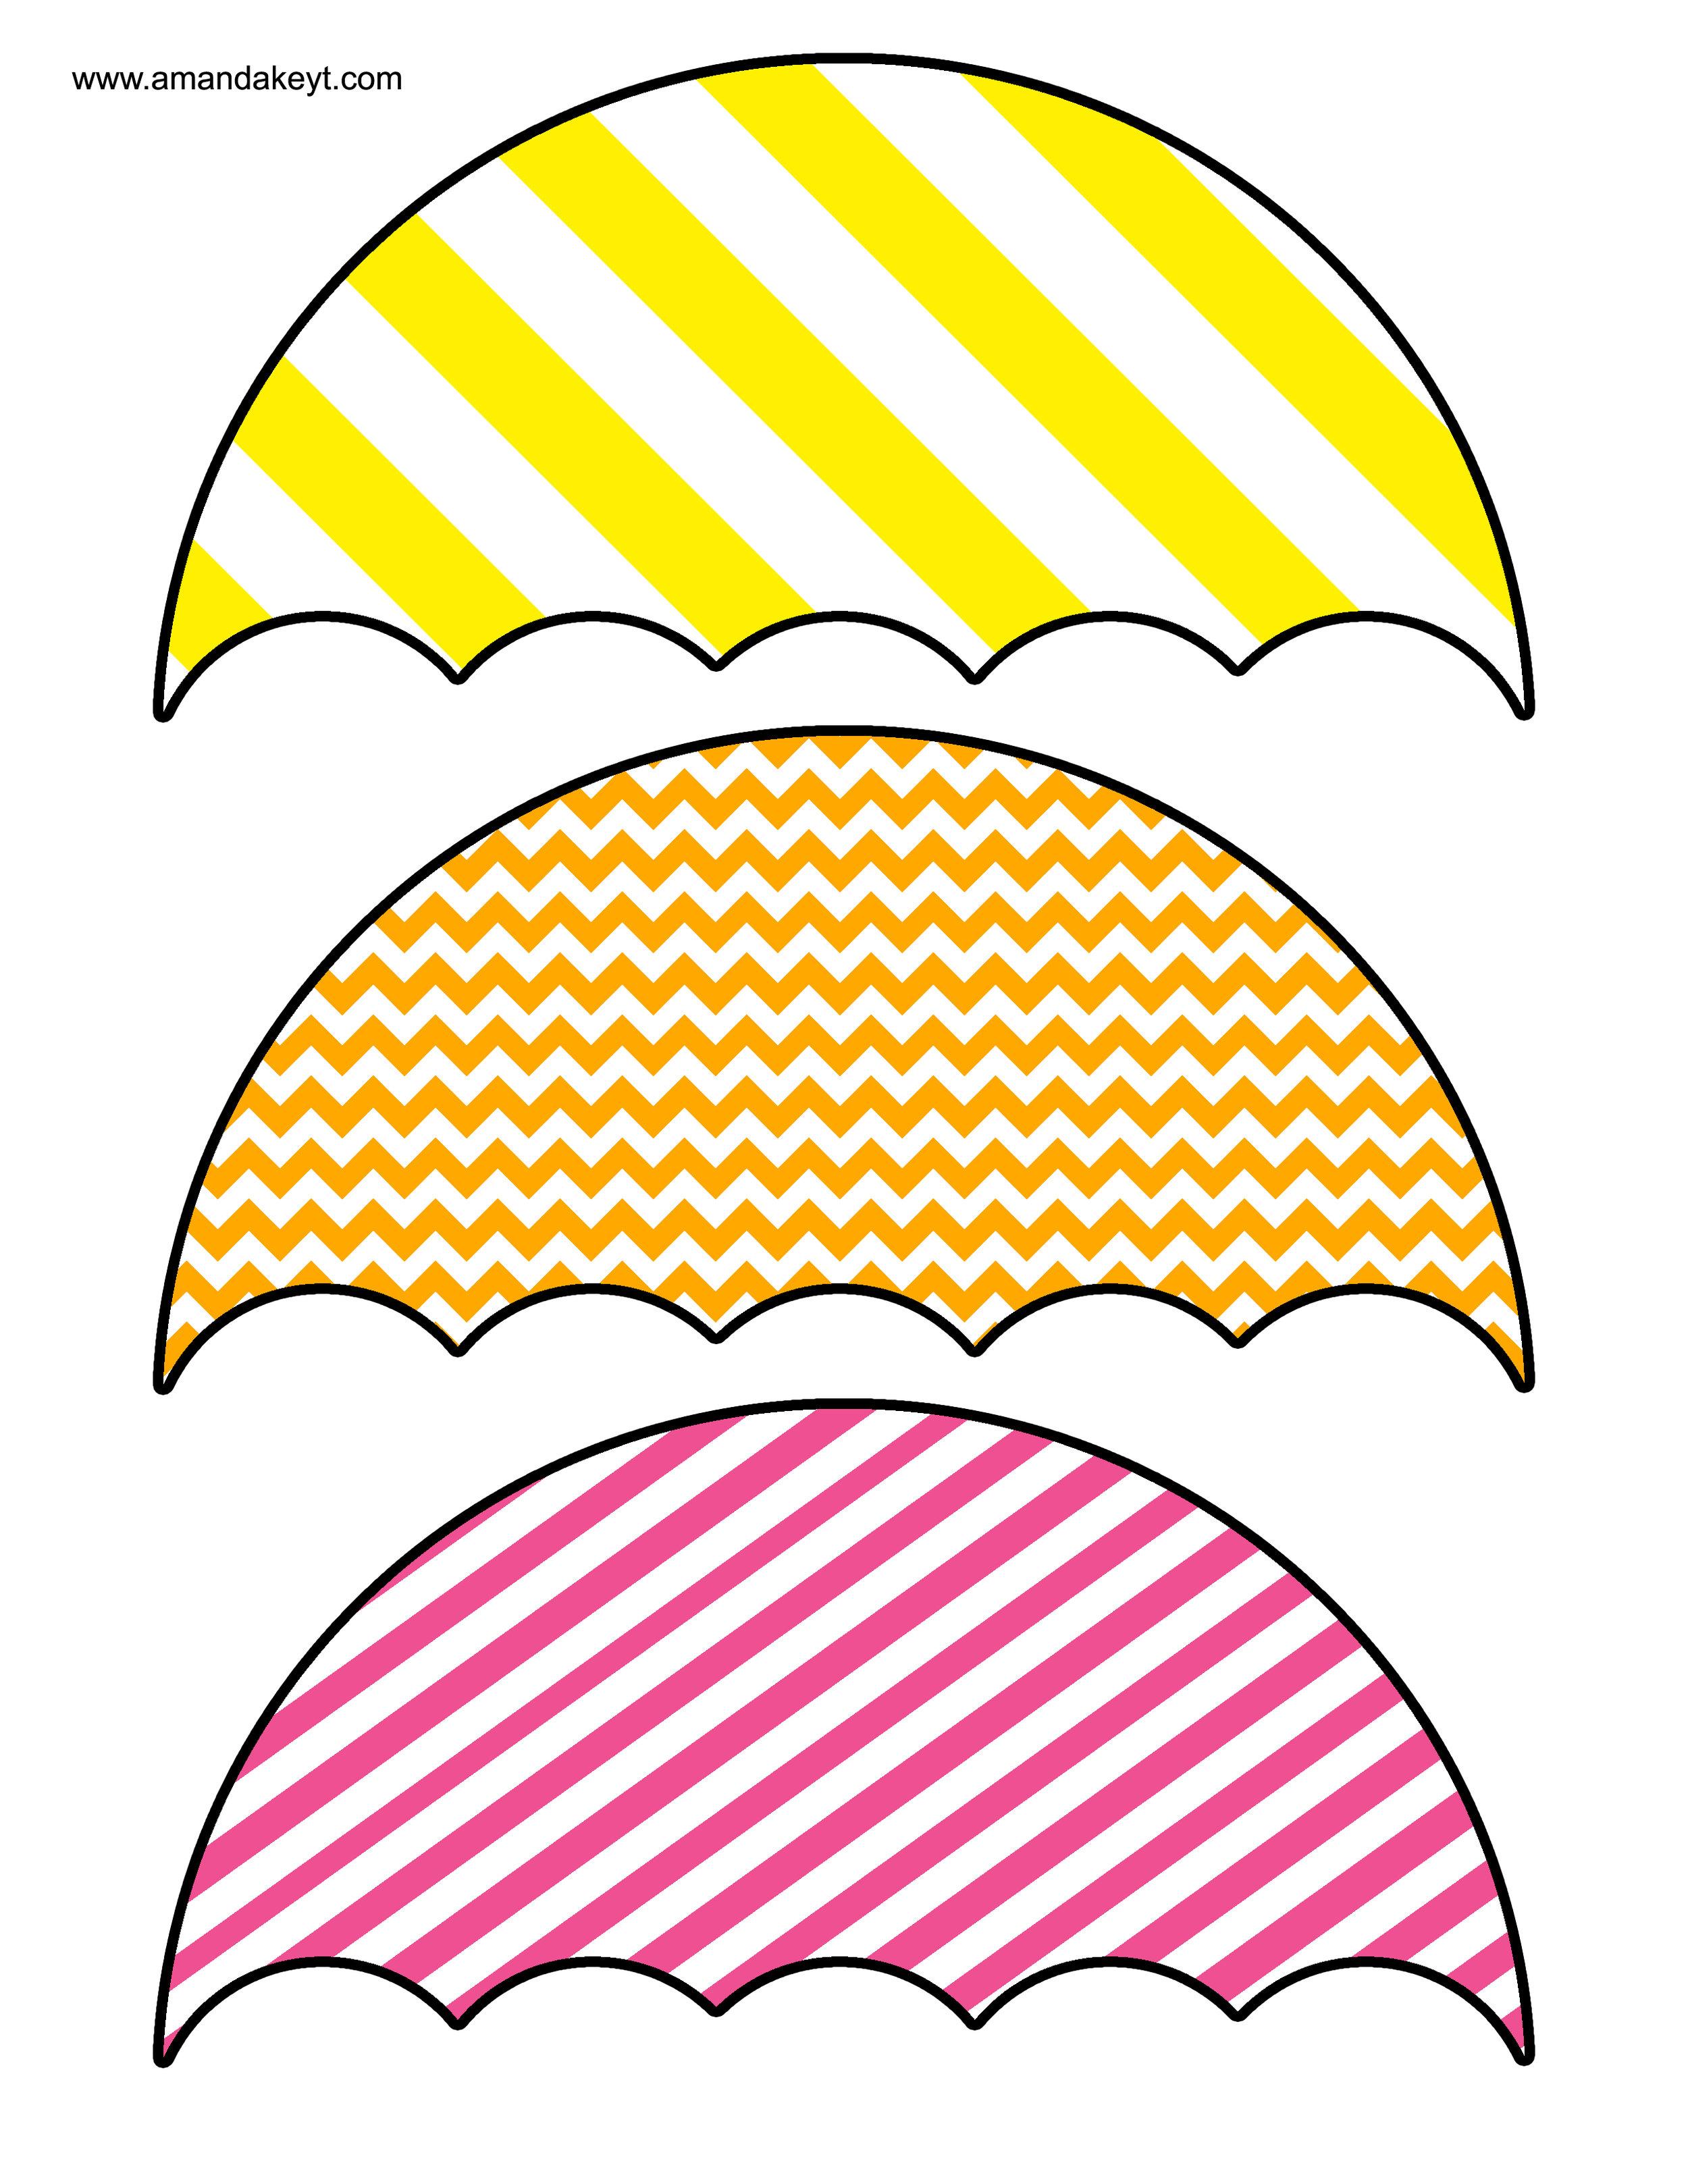 UmbrellaToppers.jpg